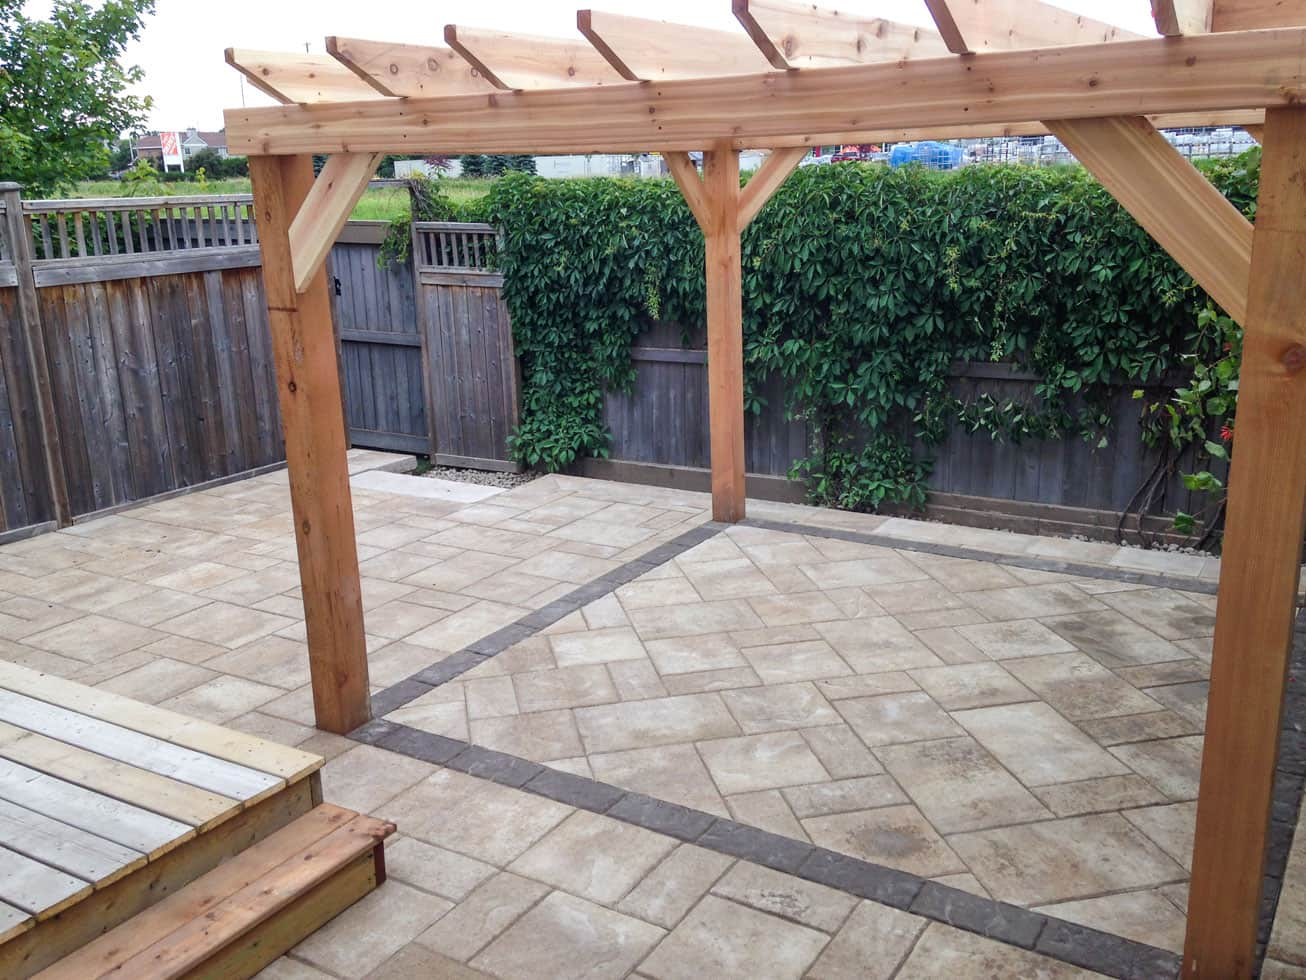 interlock patio with wooden pergola